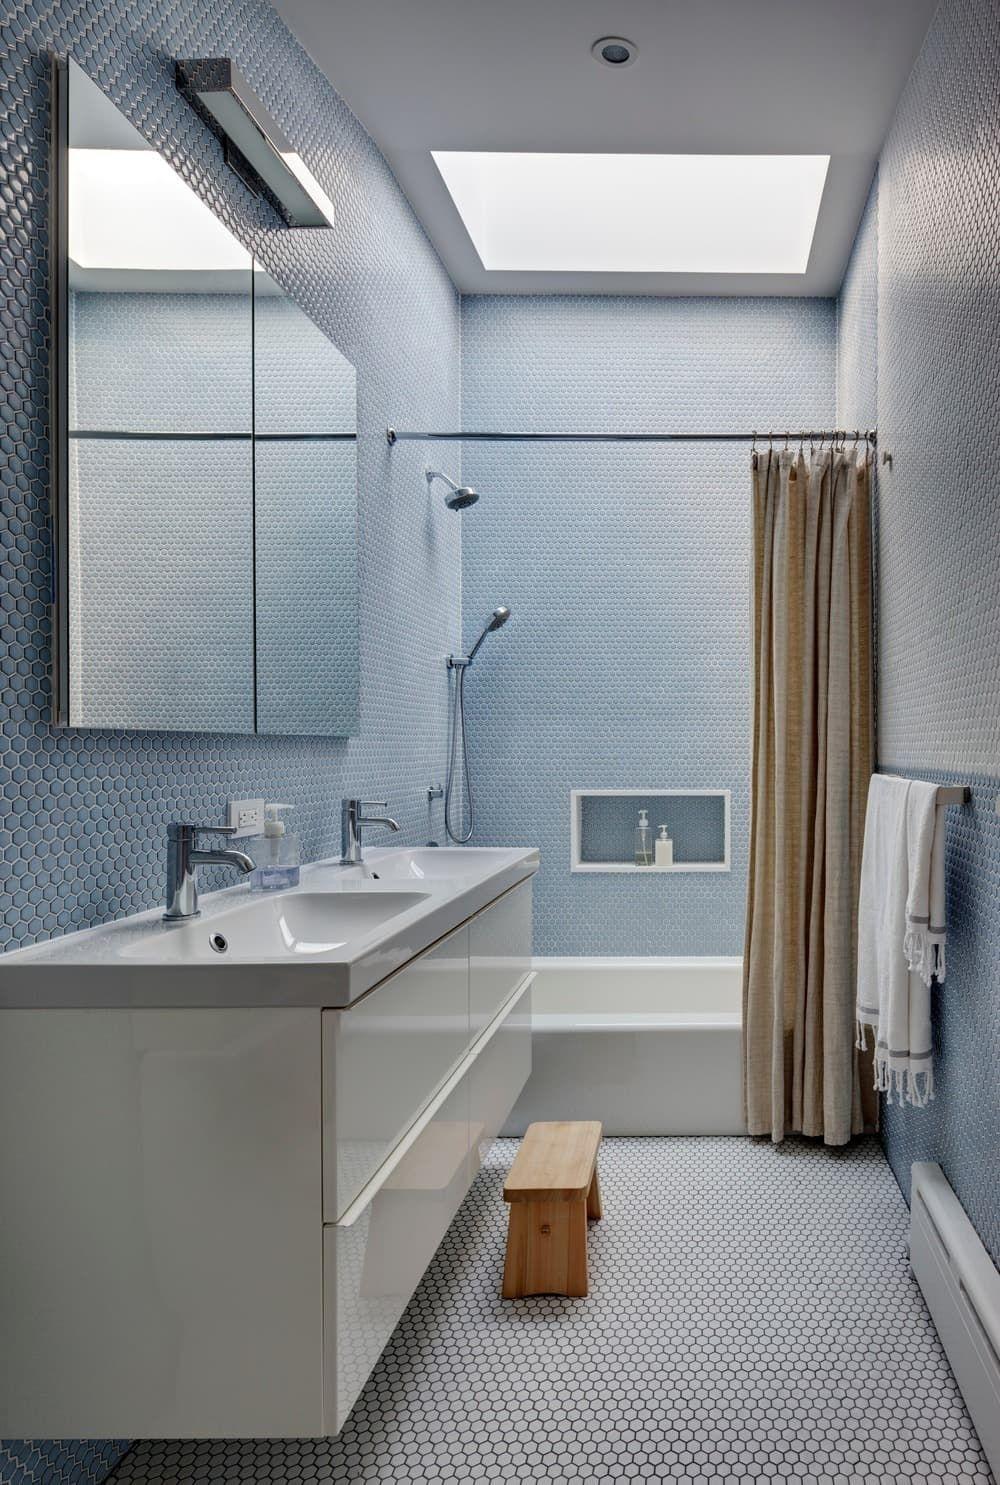 33 Terrific Small Primary Bathroom Ideas 2020 Photos Small Master Bathroom Skylight Bathroom Bathroom Remodel Master